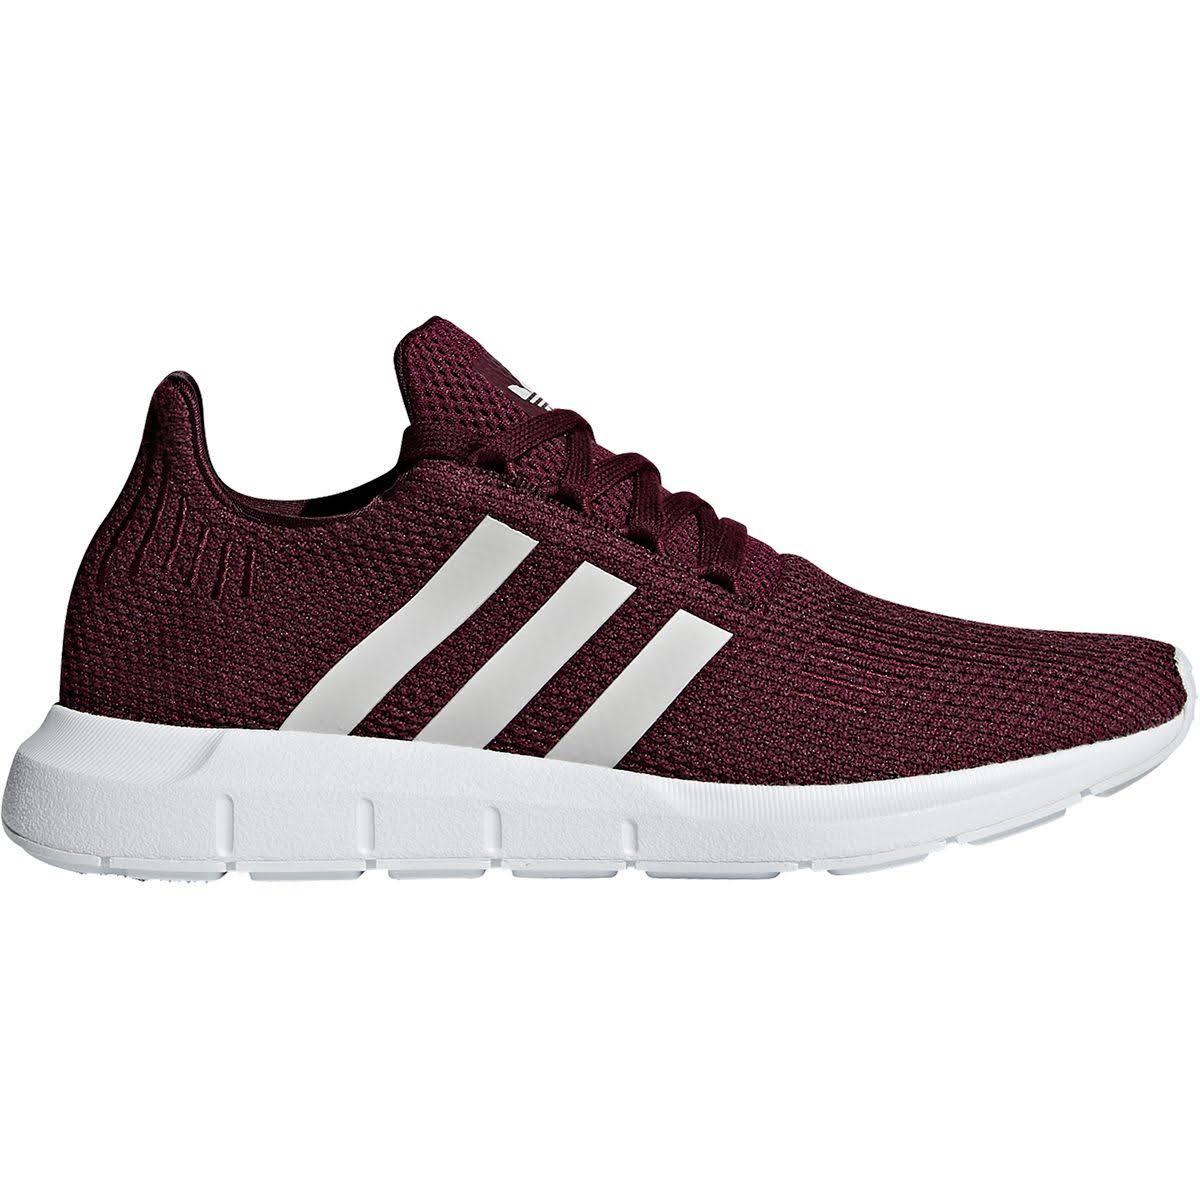 RunDonna Swift Swift Swift Adidas RunDonna Adidas RunDonna Adidas Swift Adidas RunDonna Adidas Adidas Swift RunDonna lKJ1cuTF3